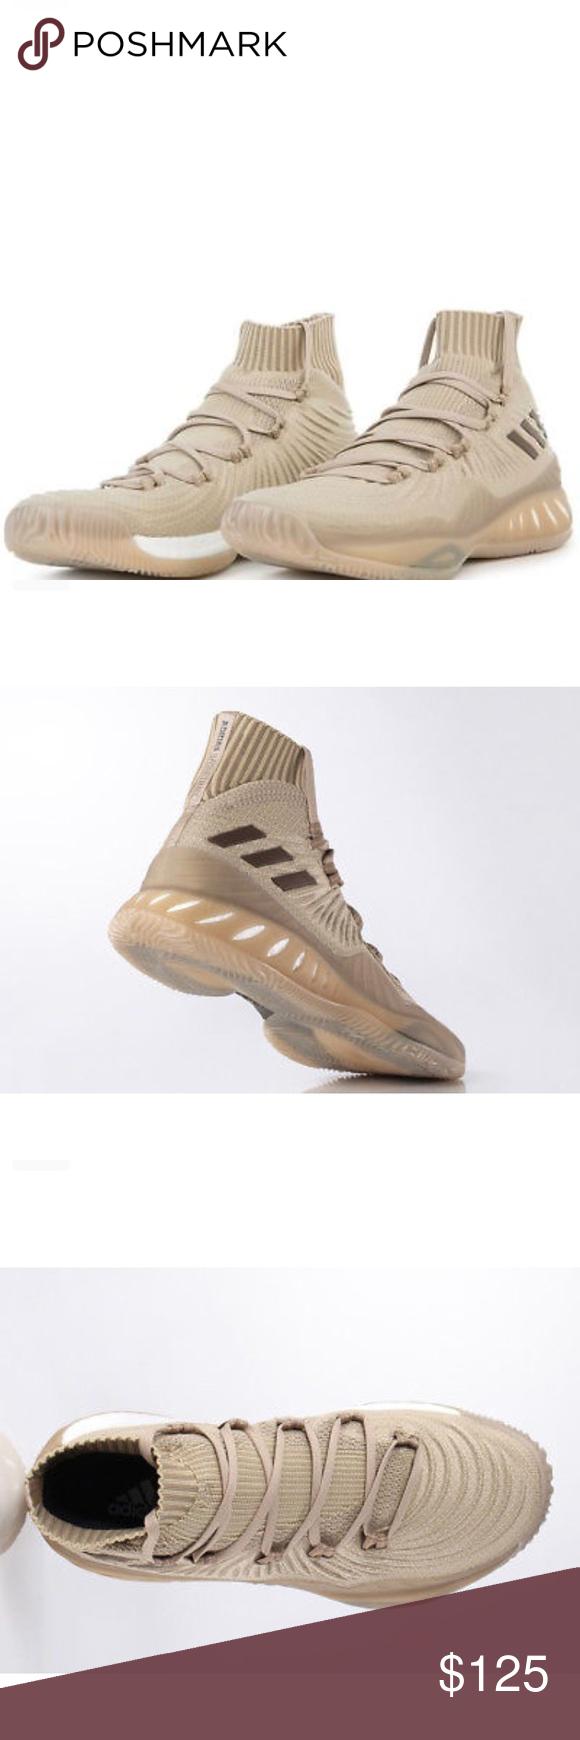 brand new 01320 f84b8 Adidas Crazy Explosive Primeknit Khaki Basketball Adidas Crazy Explosive  2017 Primeknit Trace Khaki Basketball Shoes size